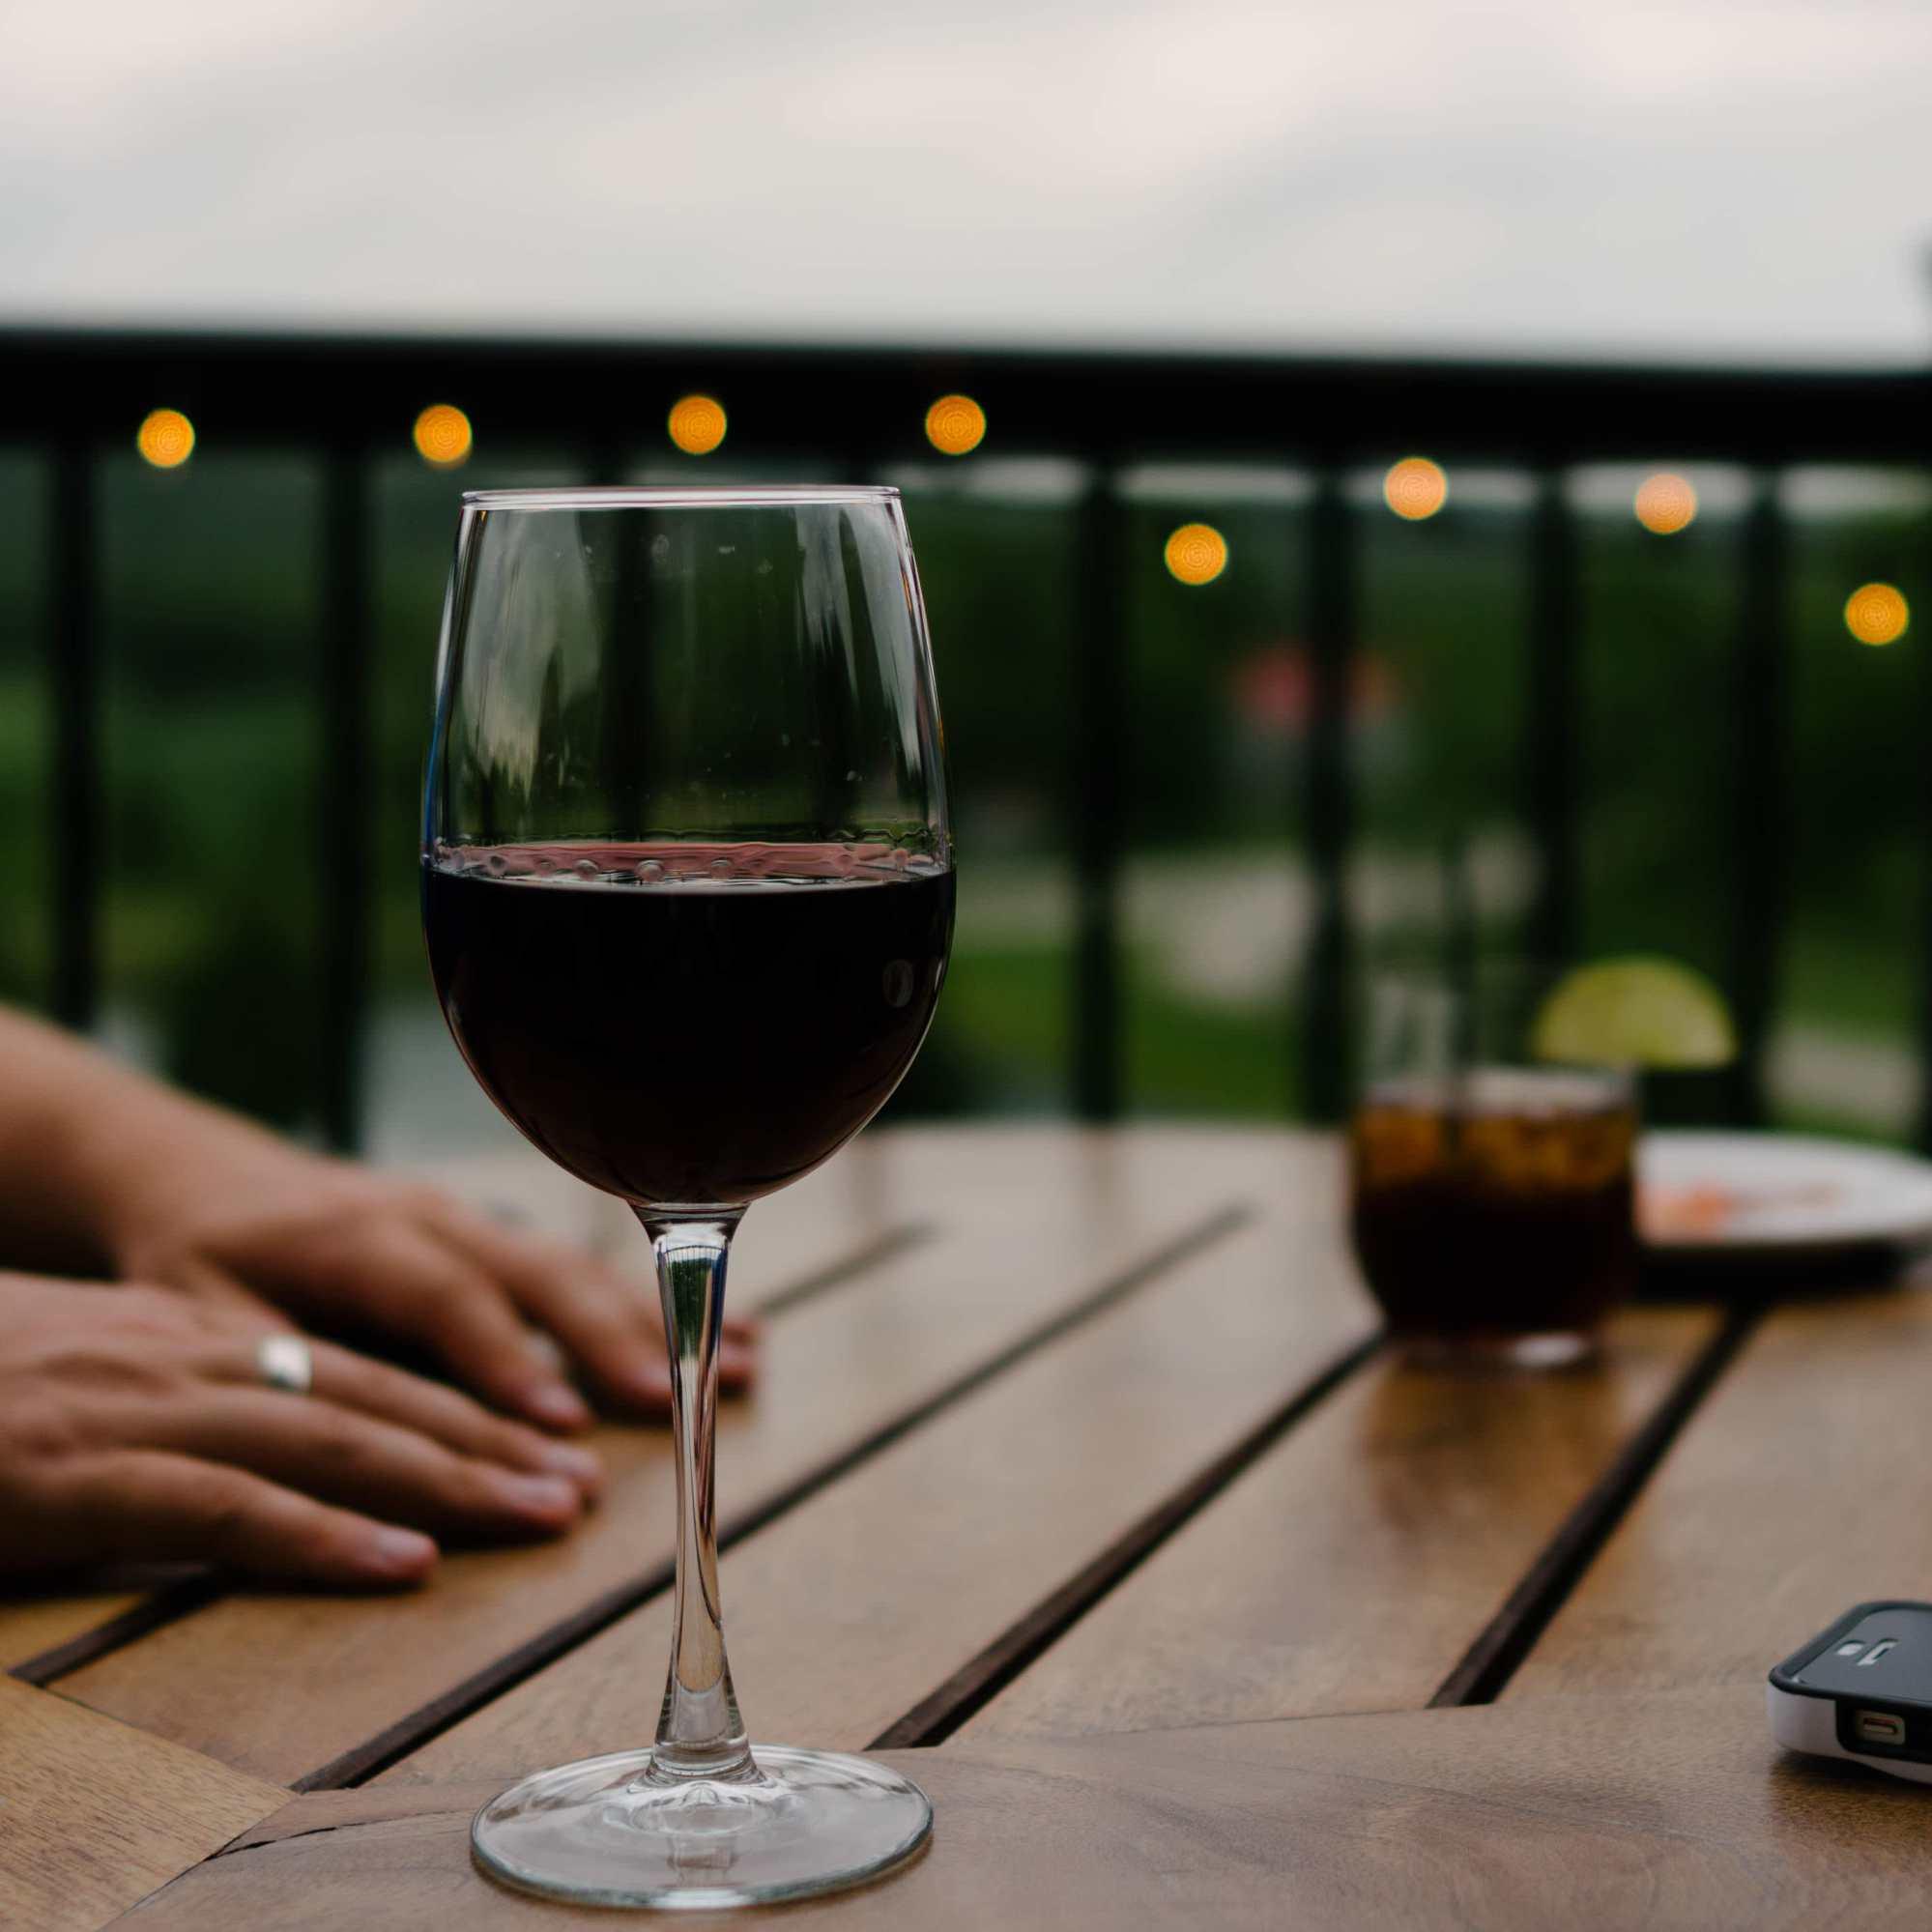 C Mo Quitar Manchas De Vino Tinto De La Ropa Lavamatica Soler  ~ Como Quitar Las Manchas De Vino Tinto